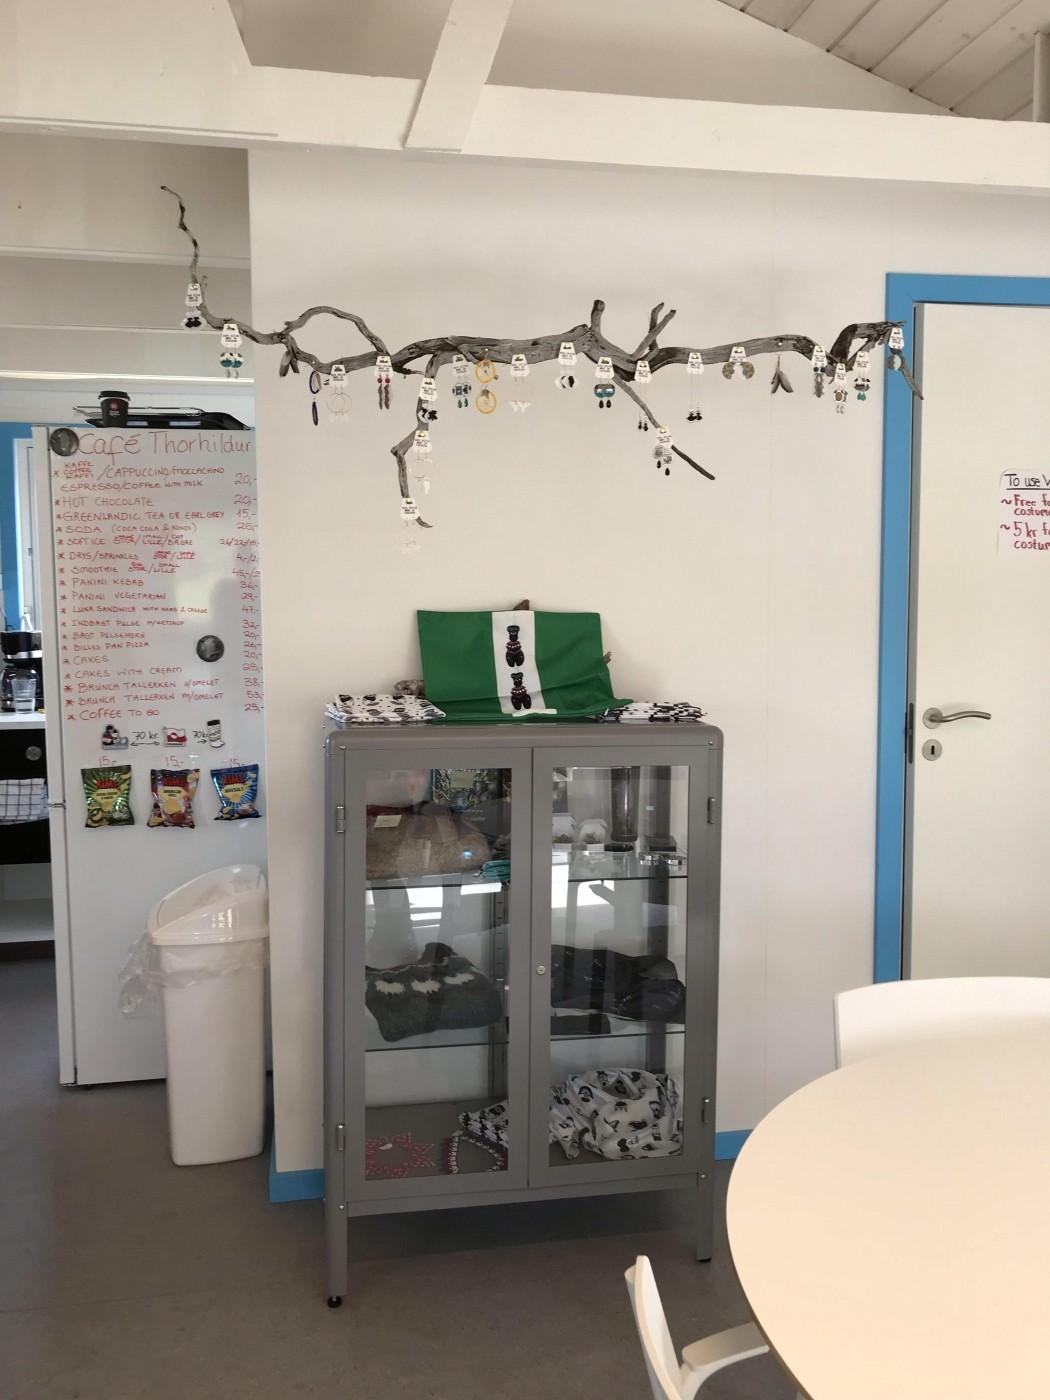 Cafe Thorhildur goods for sale